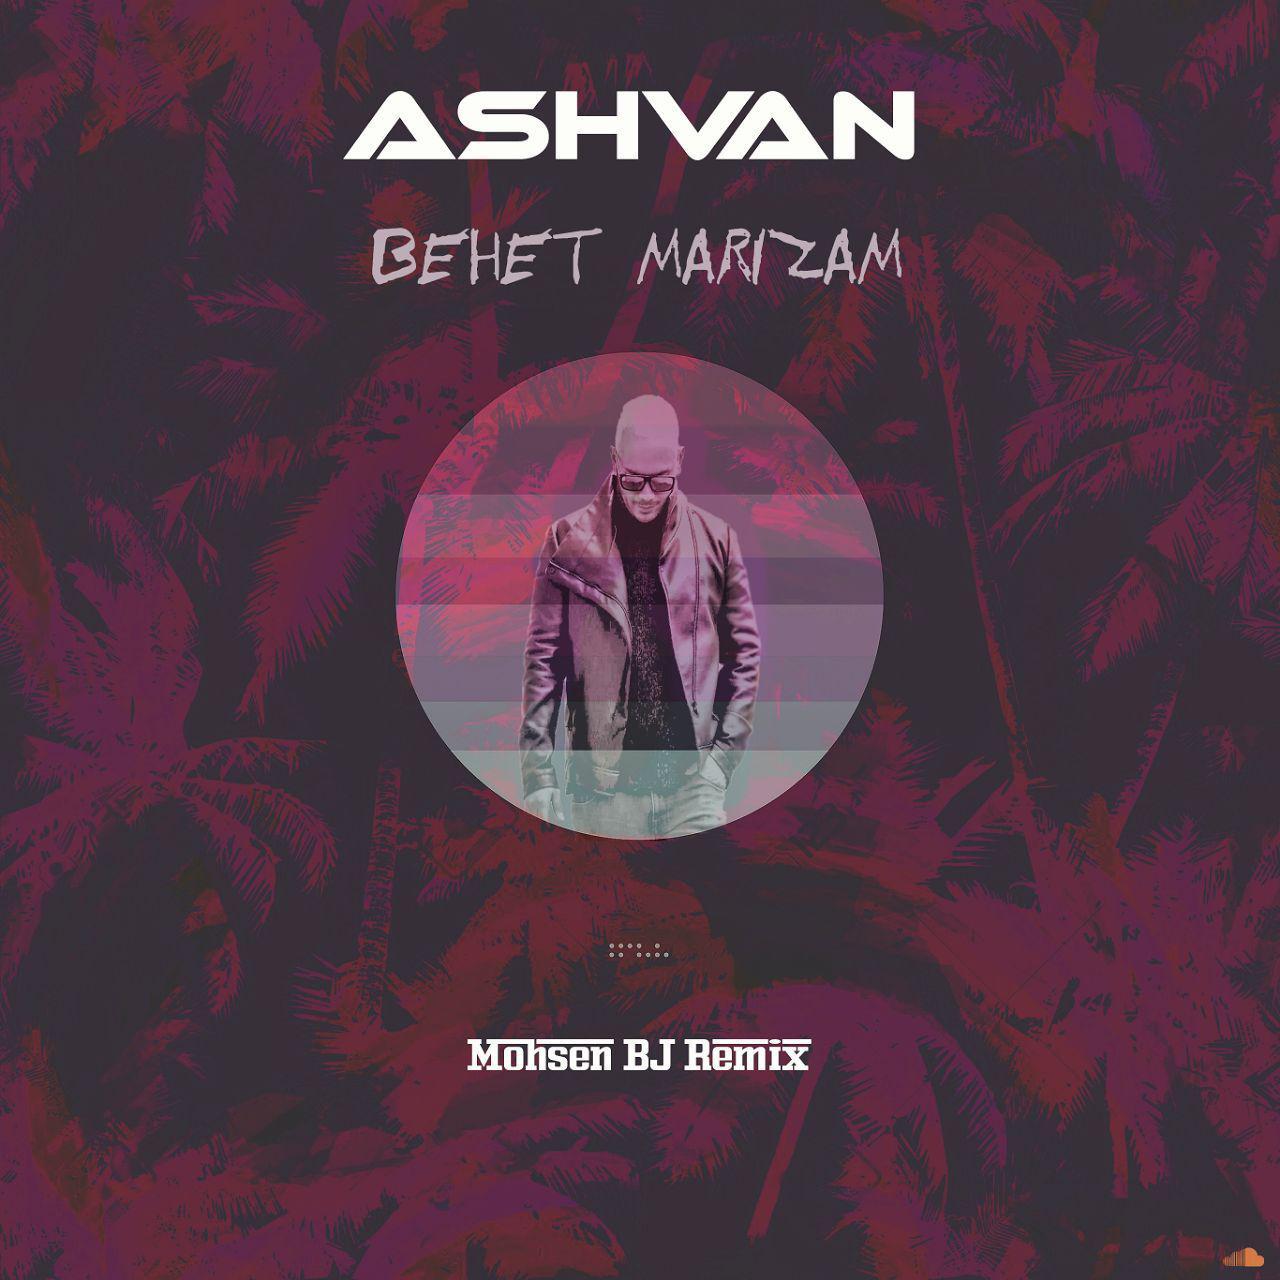 mohsen bj behet marizam remix دانلود اهنگ بهت مریضم محسن بی جی